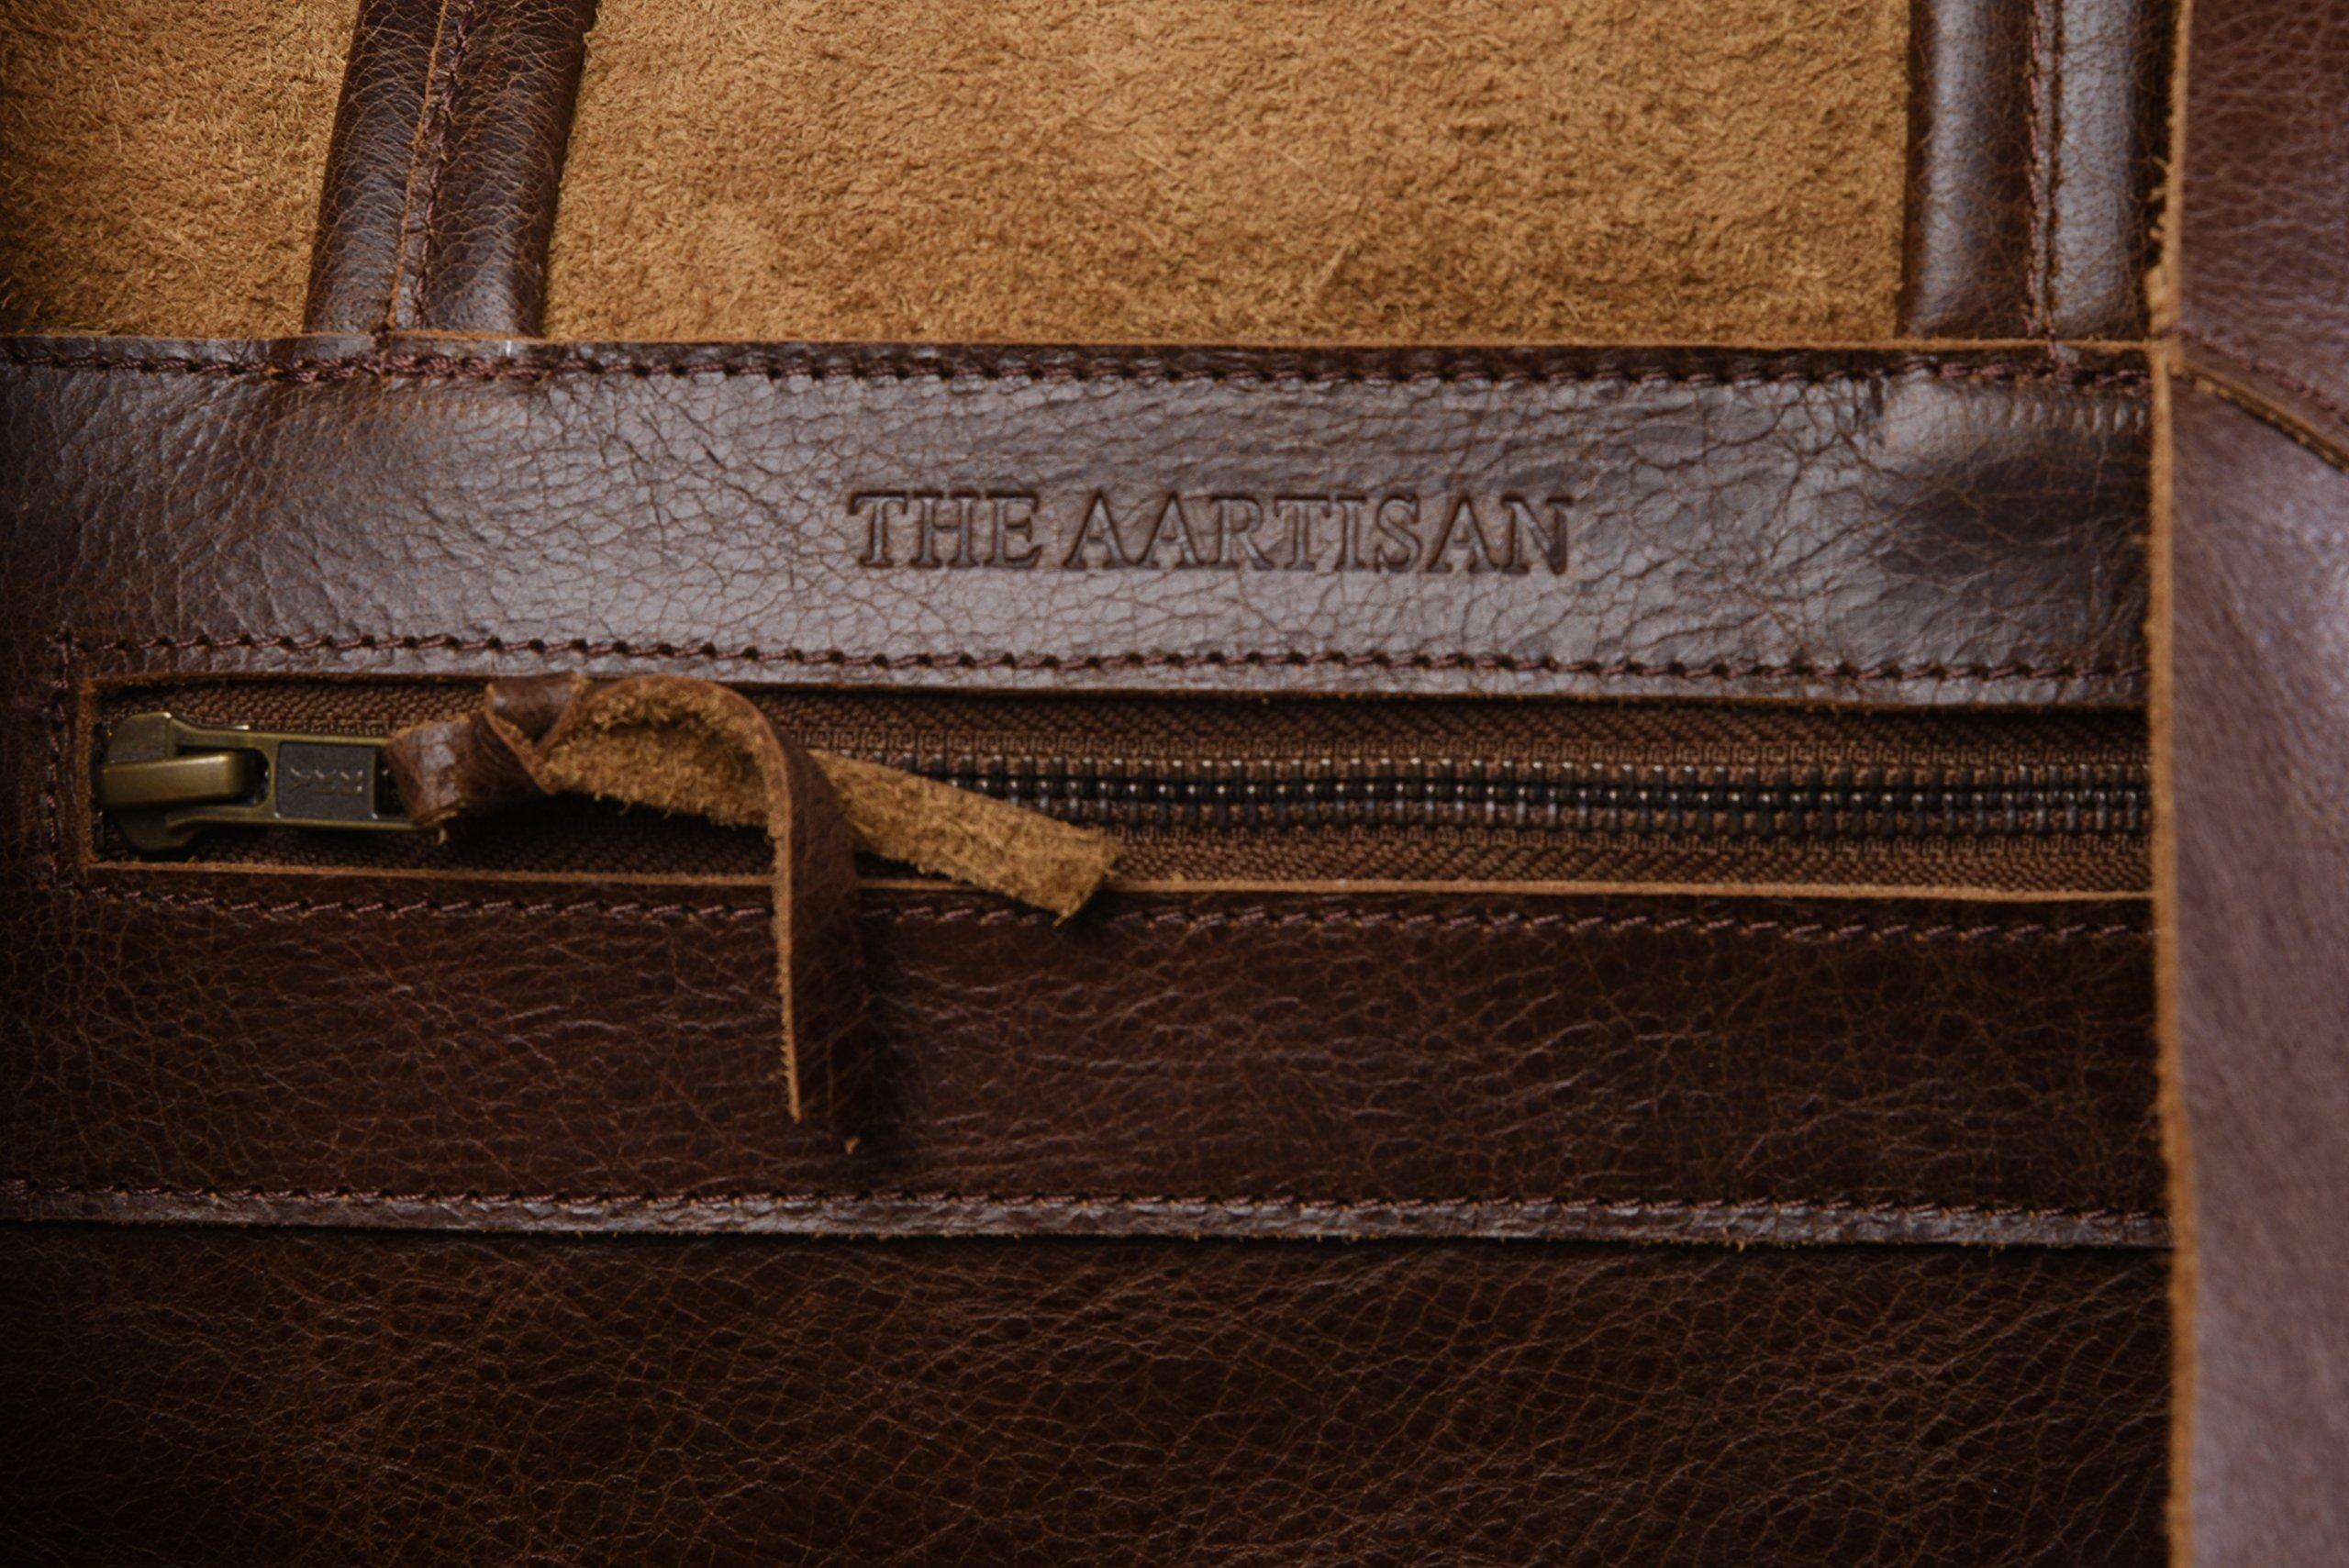 Women's Vintage Genuine Leather Tote Shoulder Bag - Large Capacity Travel Handbag by THE AARTISAN (Image #7)